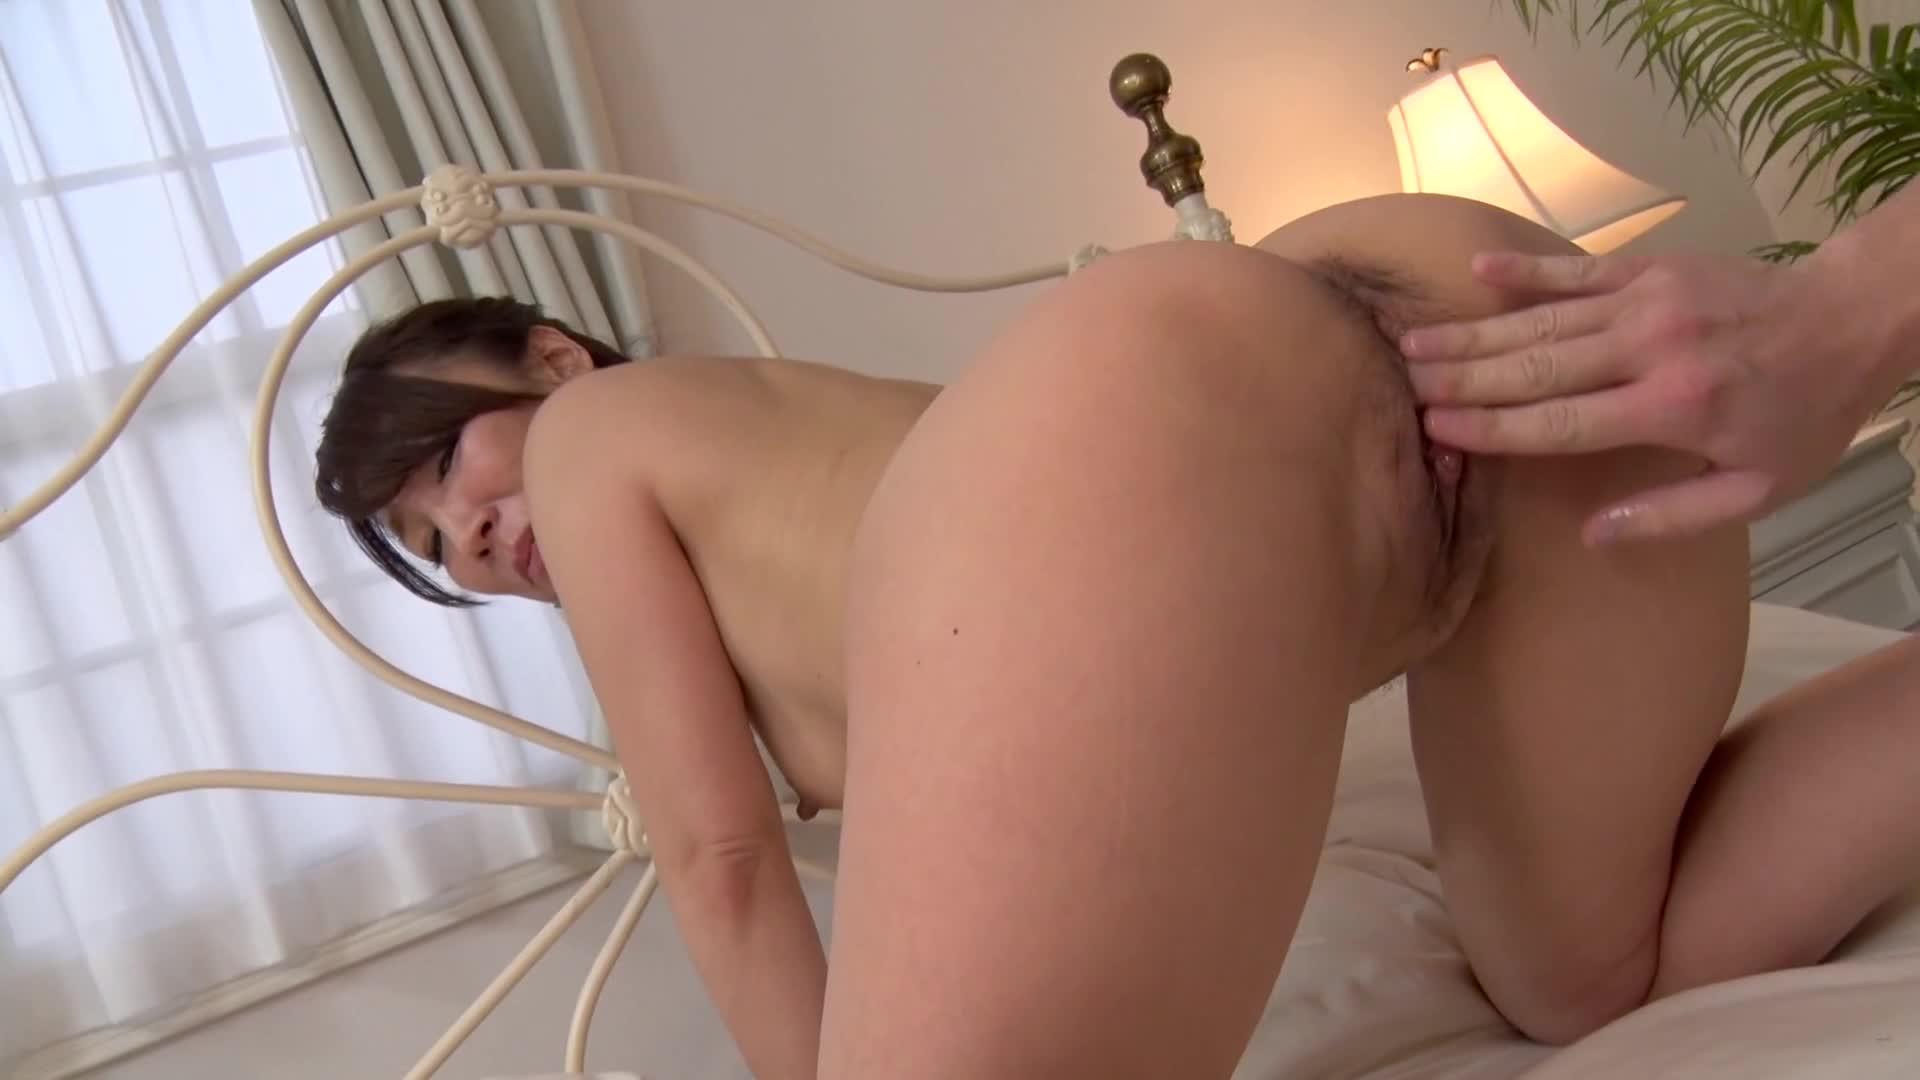 Kanae Murakami - MILF's Sexual Service at the Soapland - k2s.tv